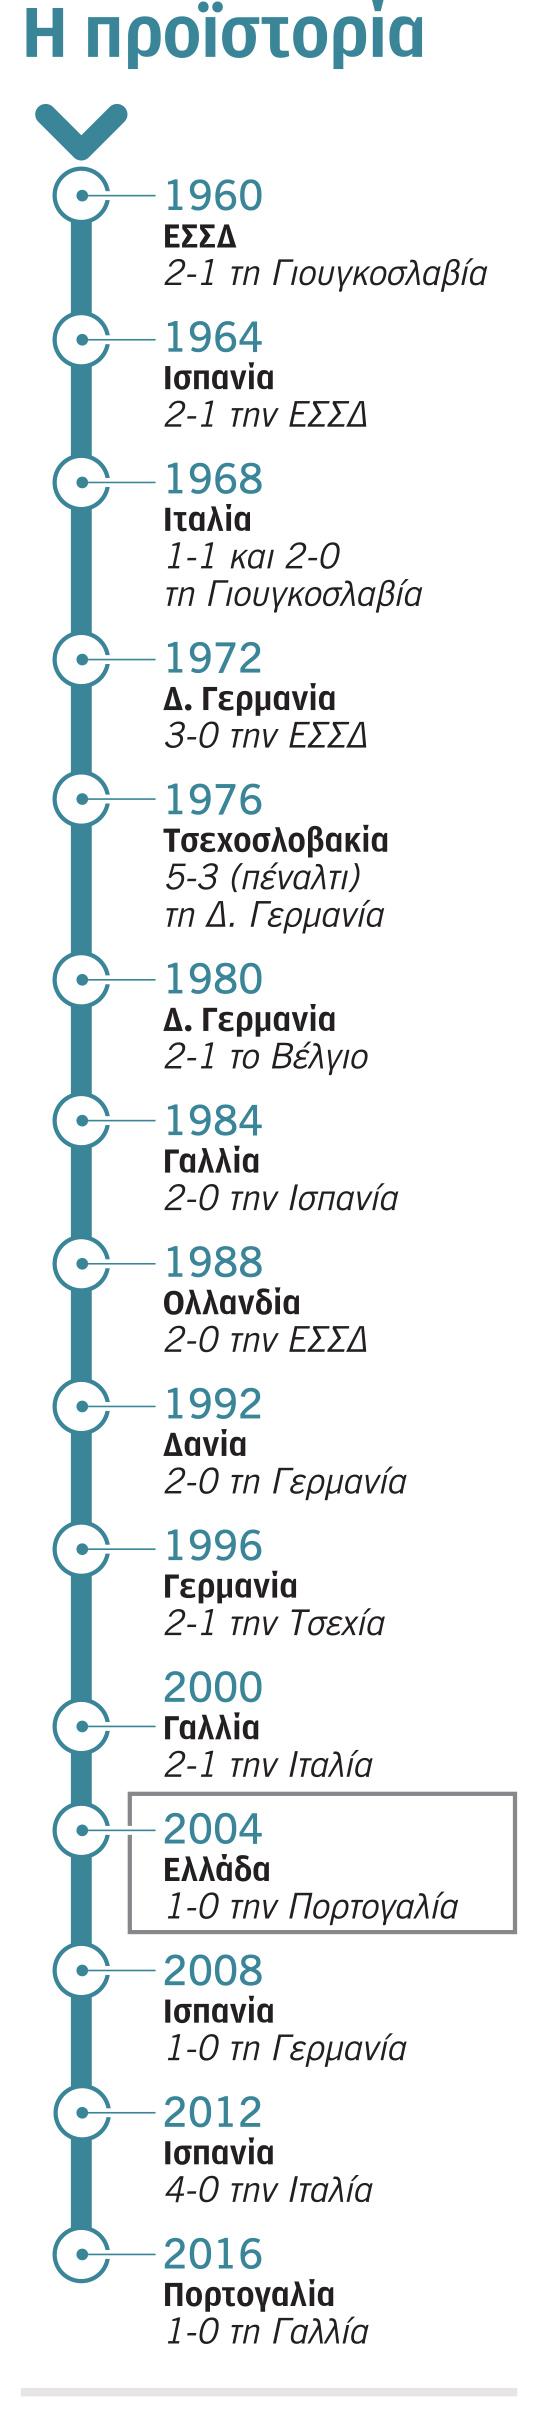 euro-2020-an-ochi-tora-tote-pote1